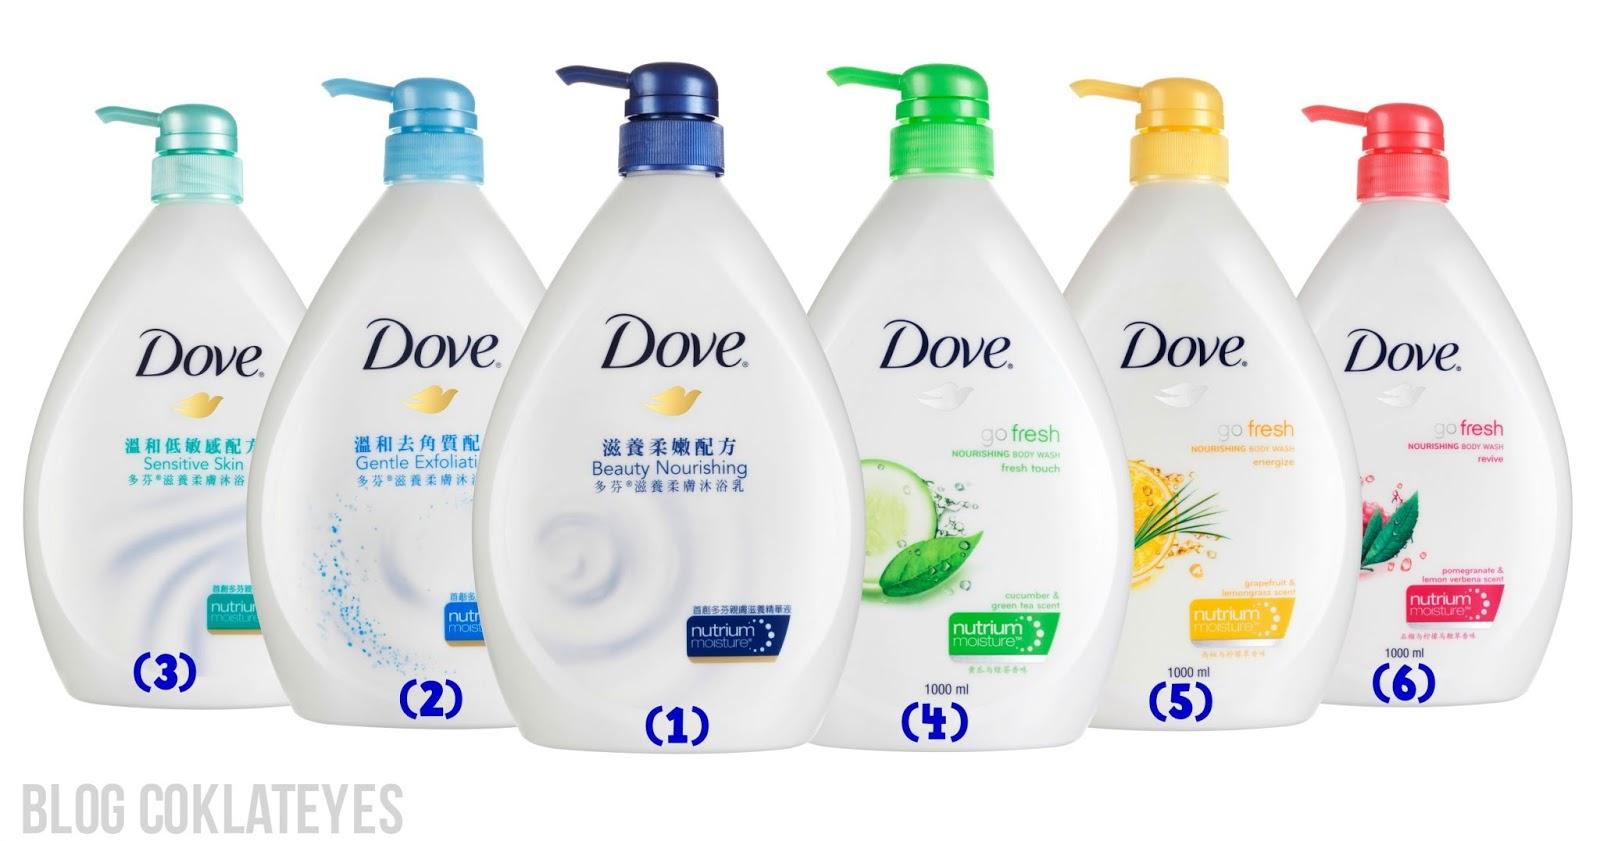 Dove School Of Skindulgence Jom Sahut Cabaran 21 Hari Untuk